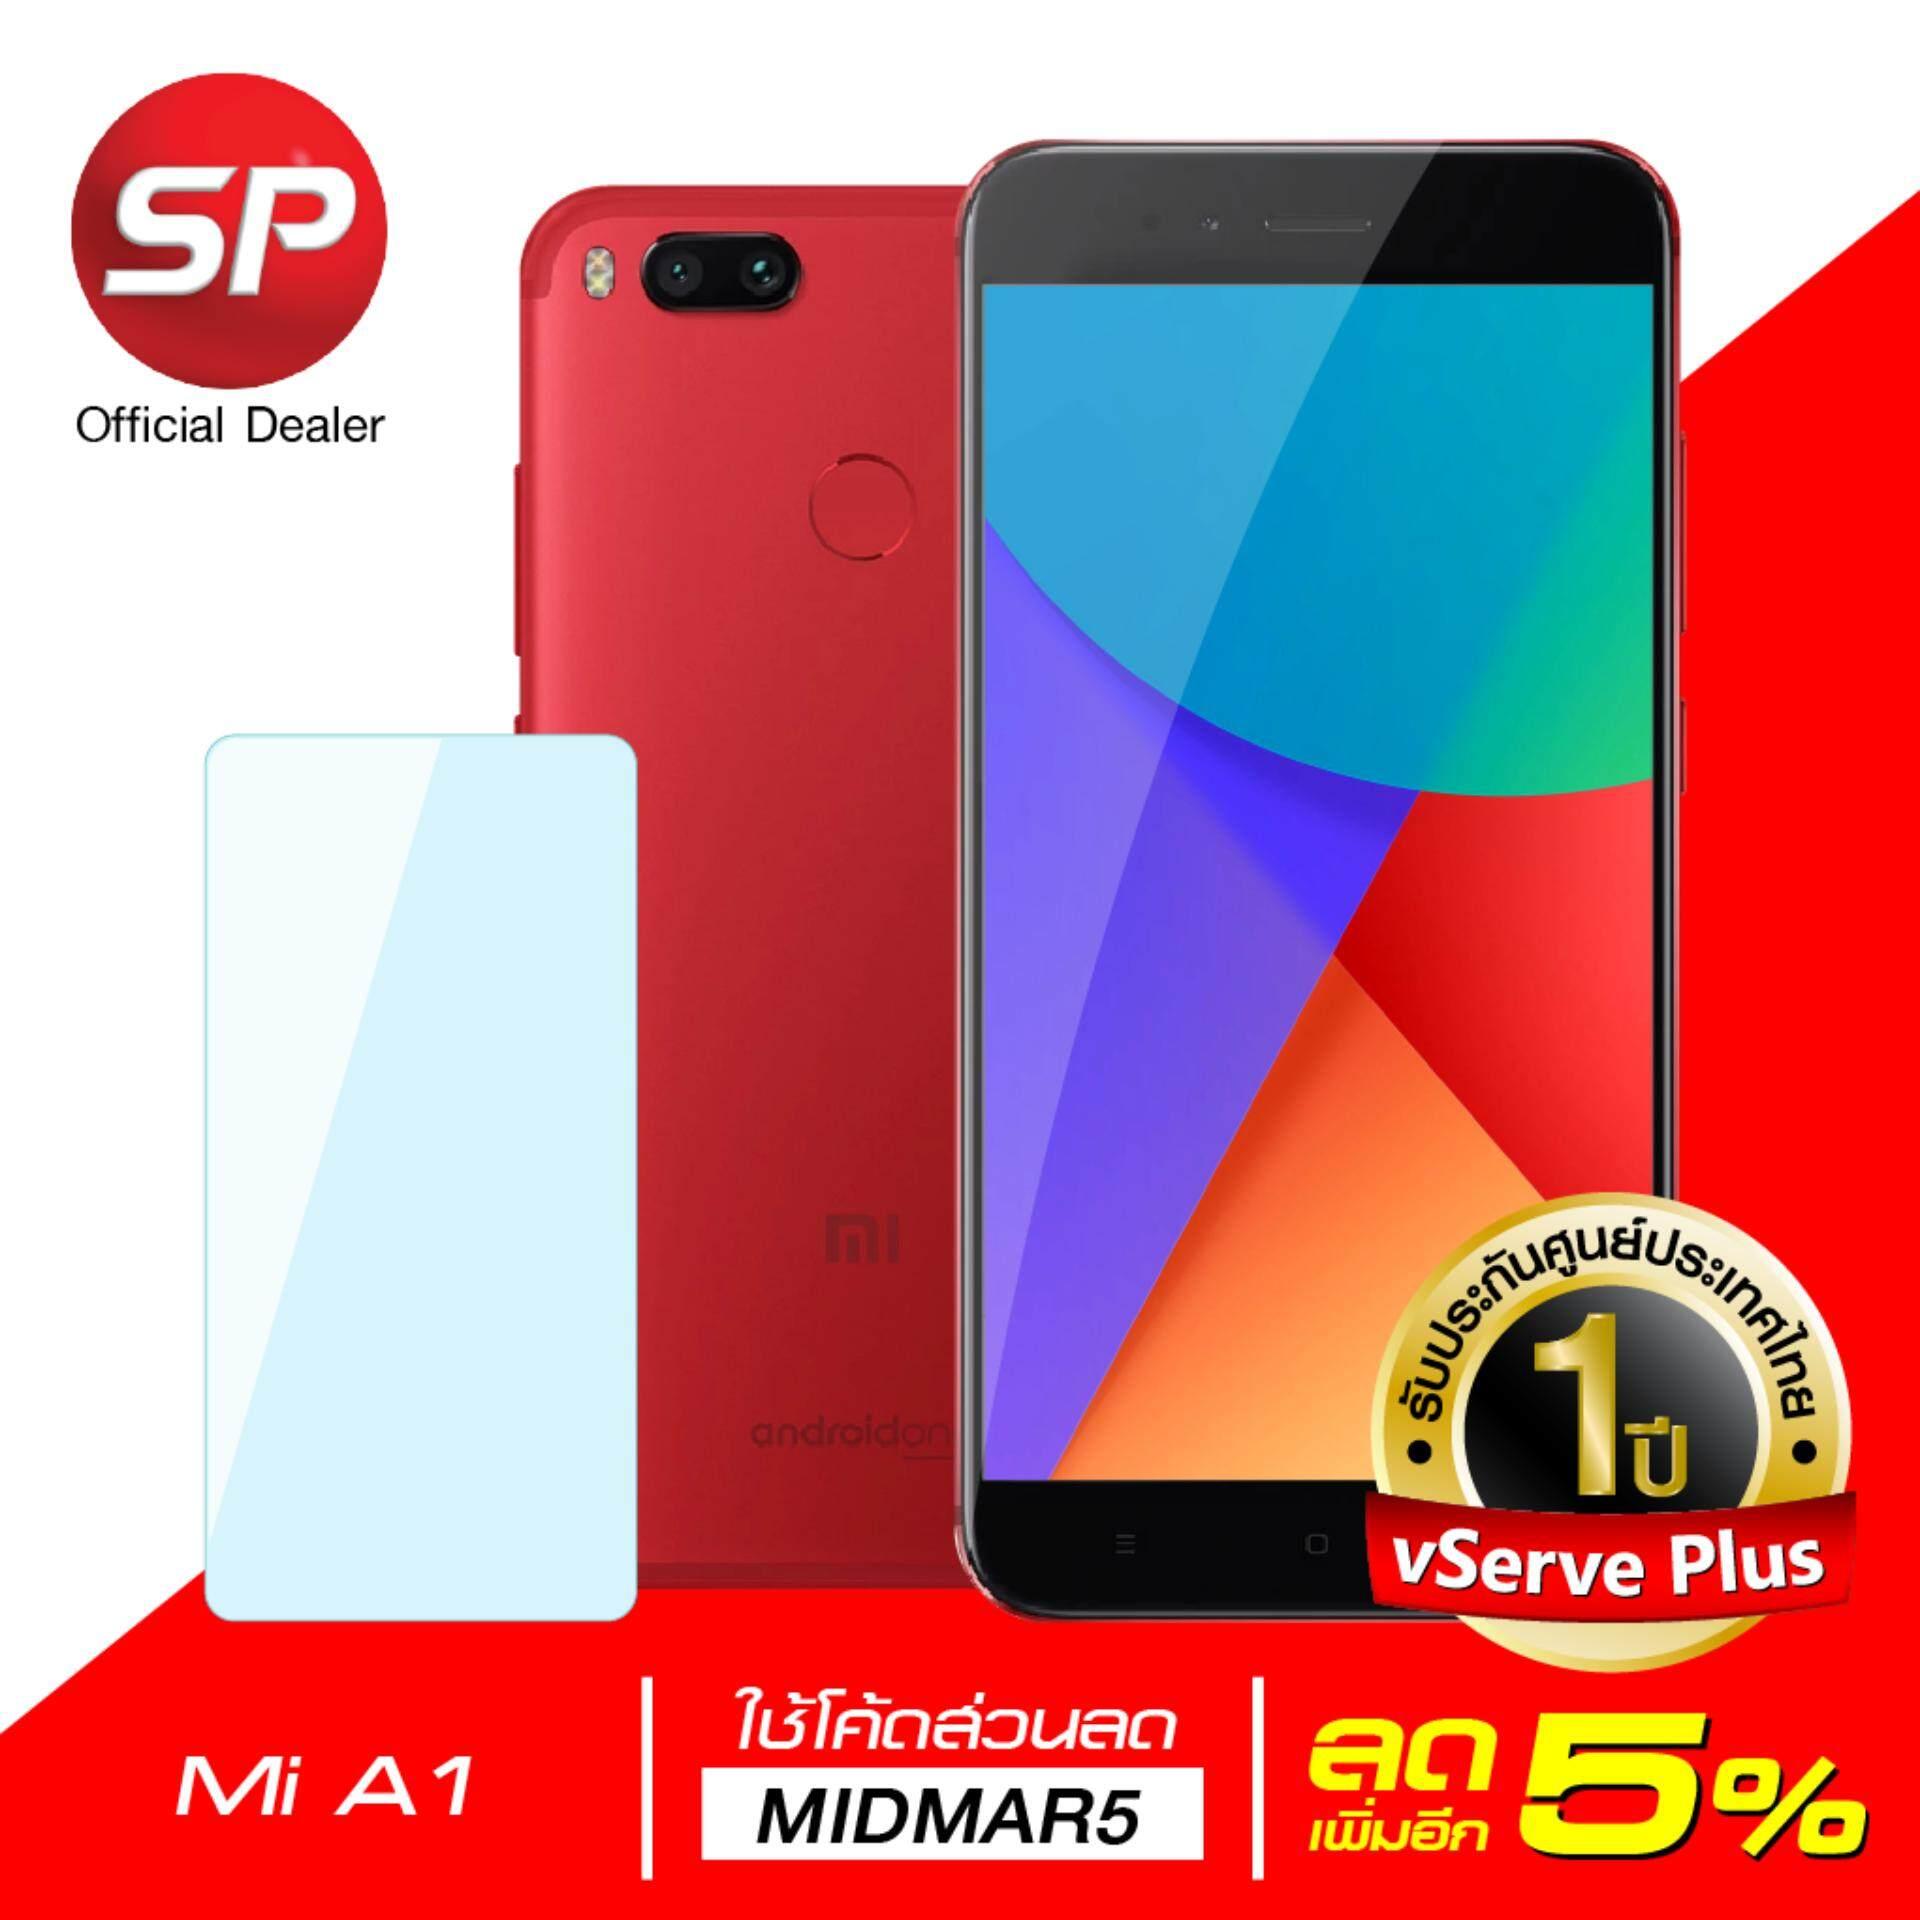 Xiaomi Mi A1 \Special Edition Red\ (4/64GB) พร้อมฟิล์มกันรอยหน้าจอ มูลค่า 199.- (ระบบ Pure Android มาพร้อม Dual-Camera) รับประกันศูนย์ไทย VSTECS 1 ปีเต็ม!!